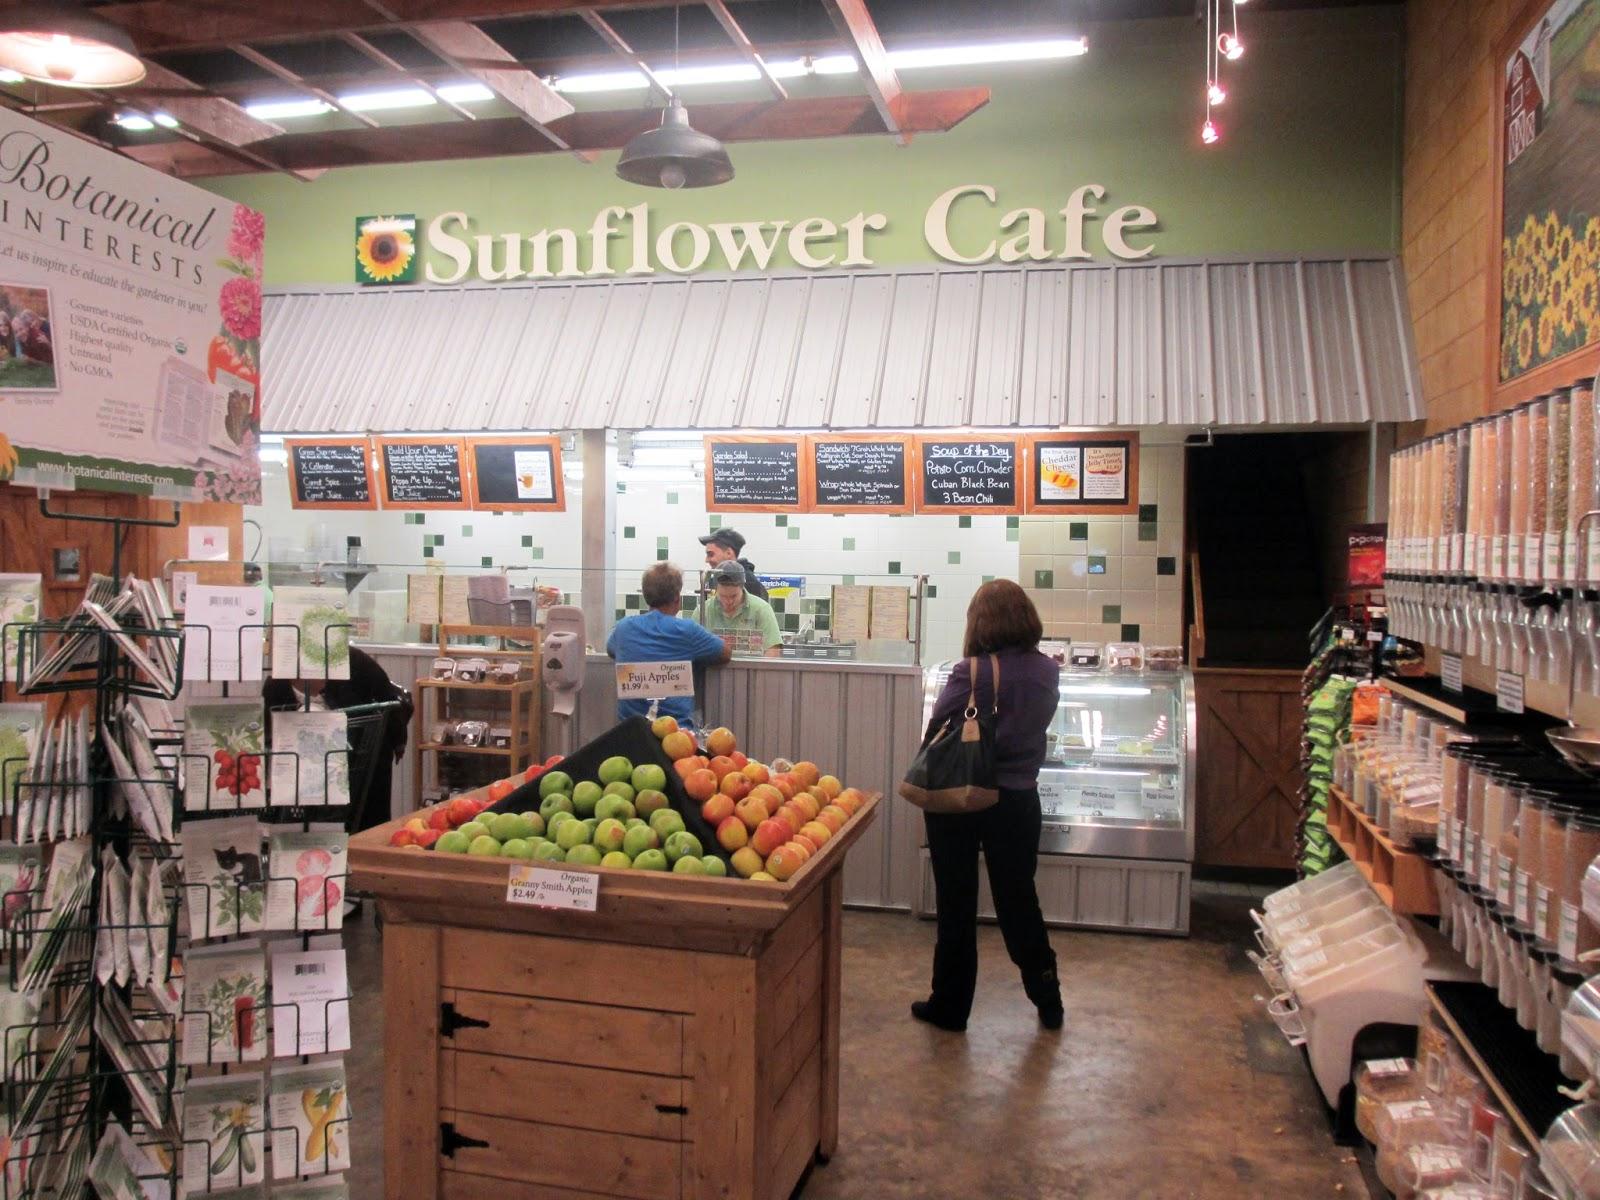 Hoover S Market Sunflower Cafe